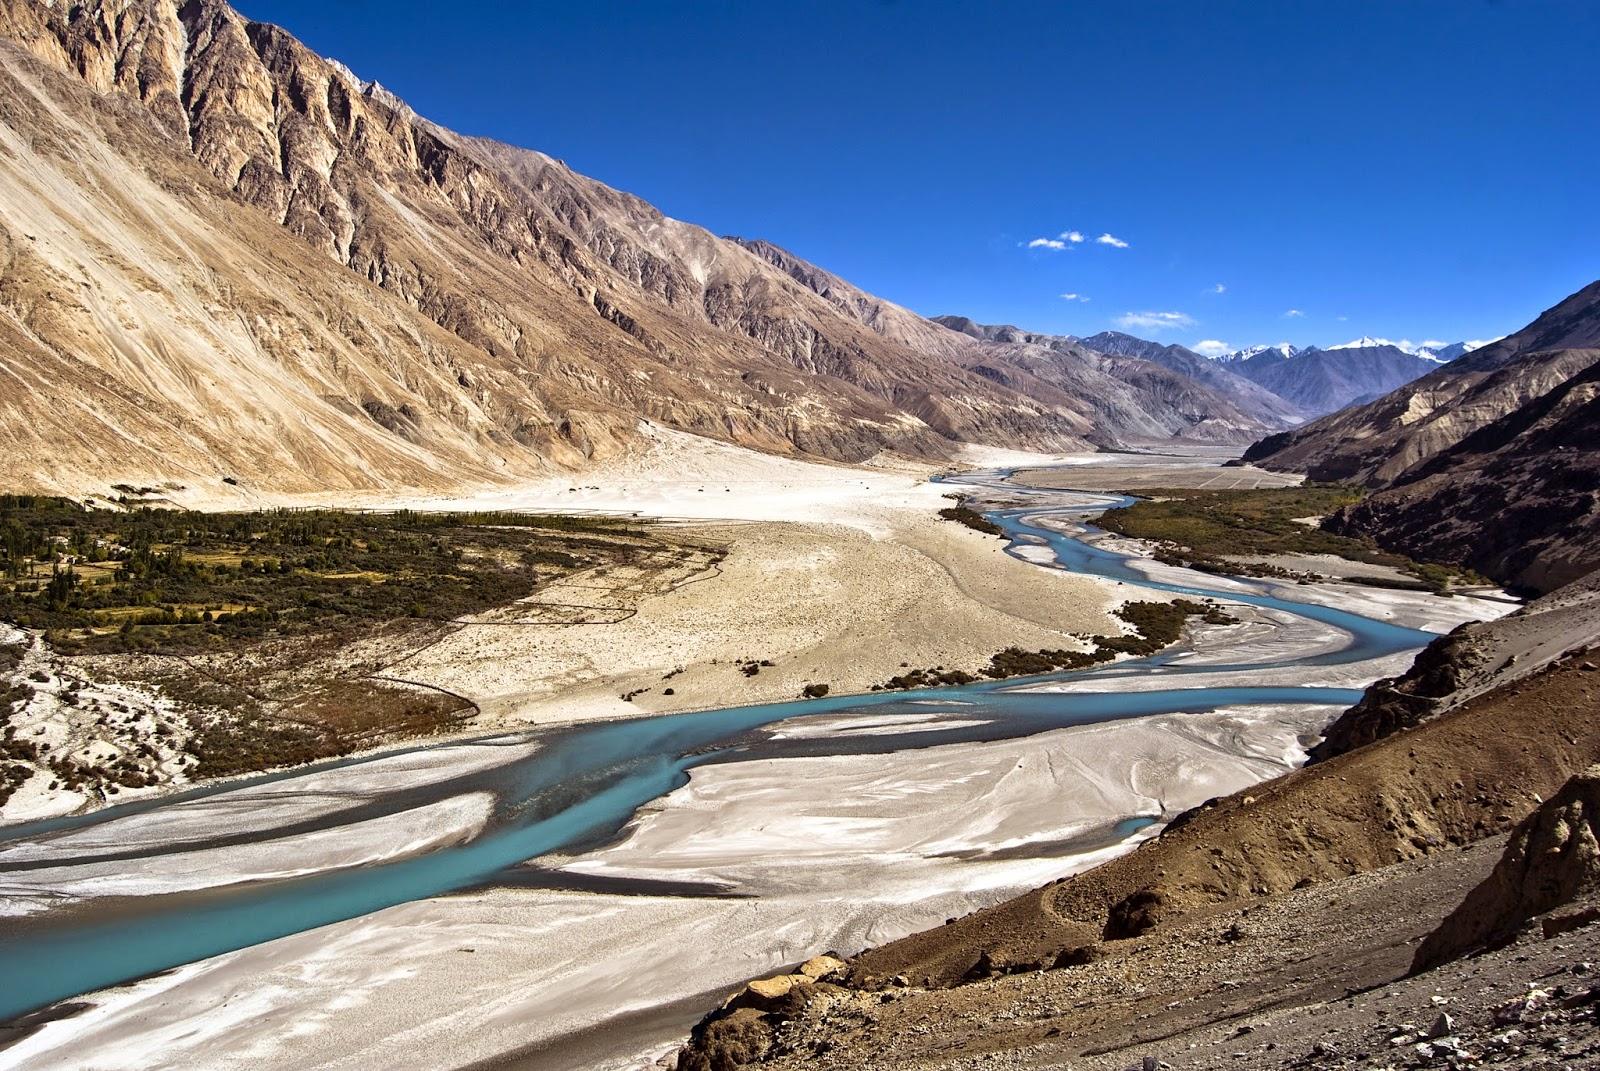 Claude Arpi Diverting The Indus Or The Yarlung Tsangpo To Xinjiang